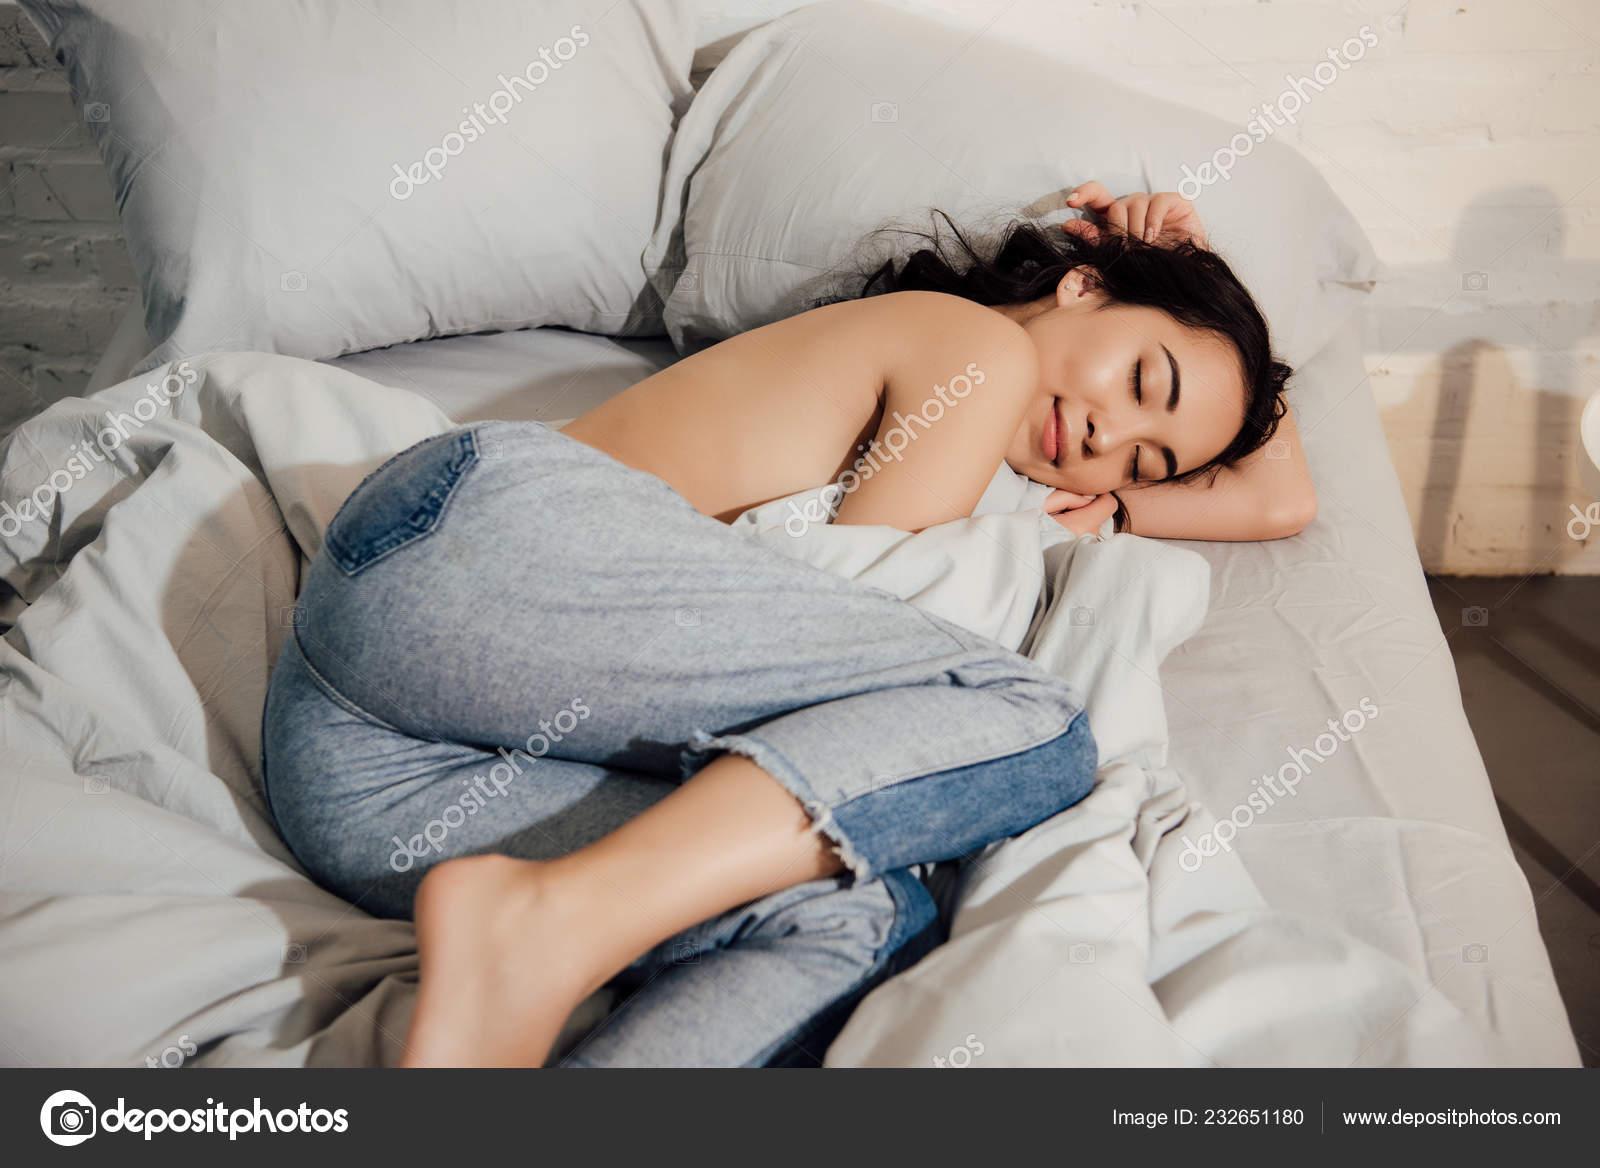 Question interesting, girl sleep topless like topic